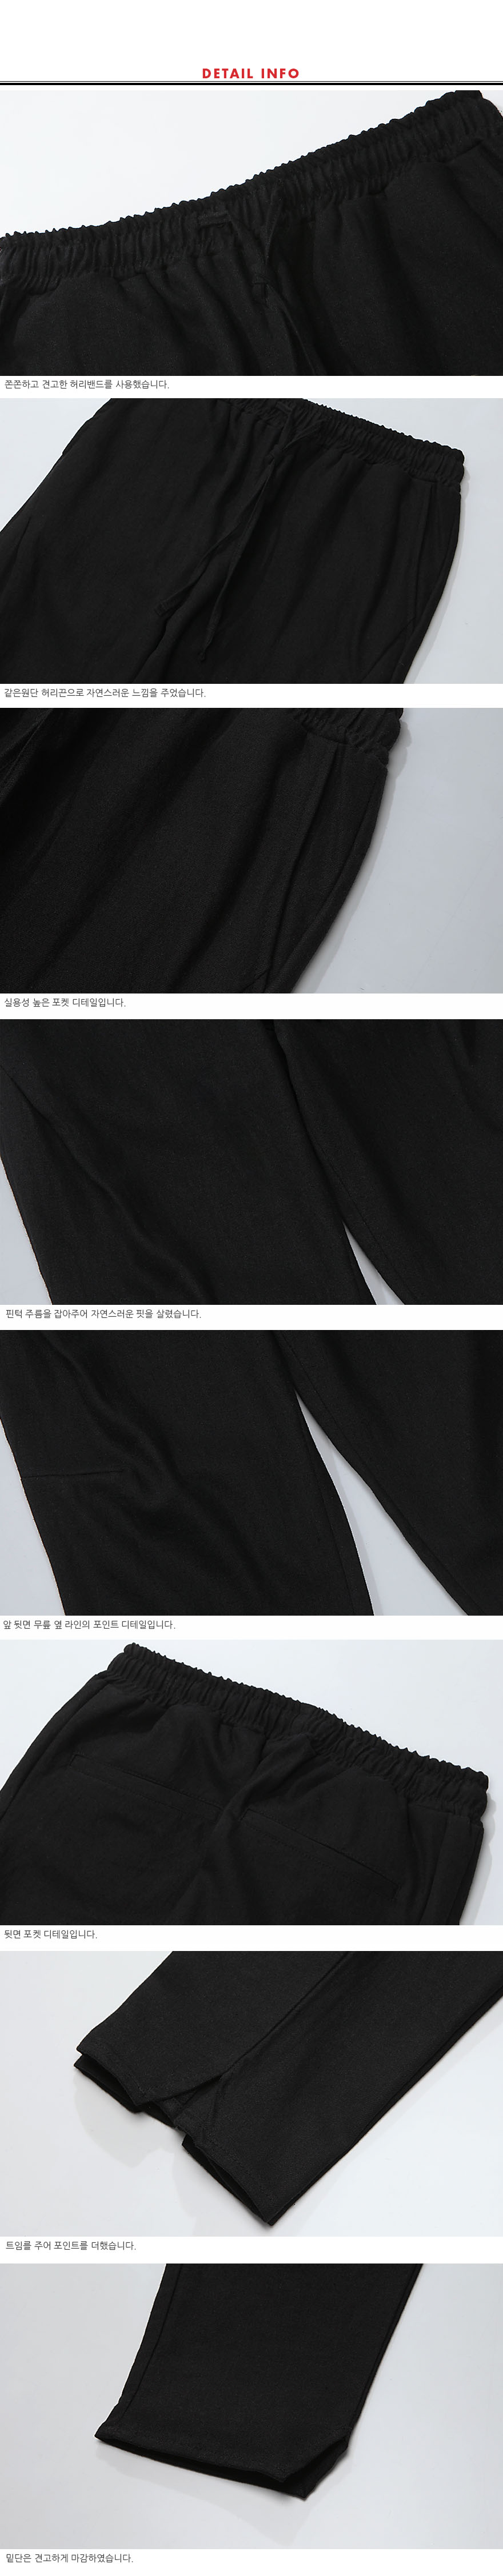 MJLP7259_detail_black.jpg